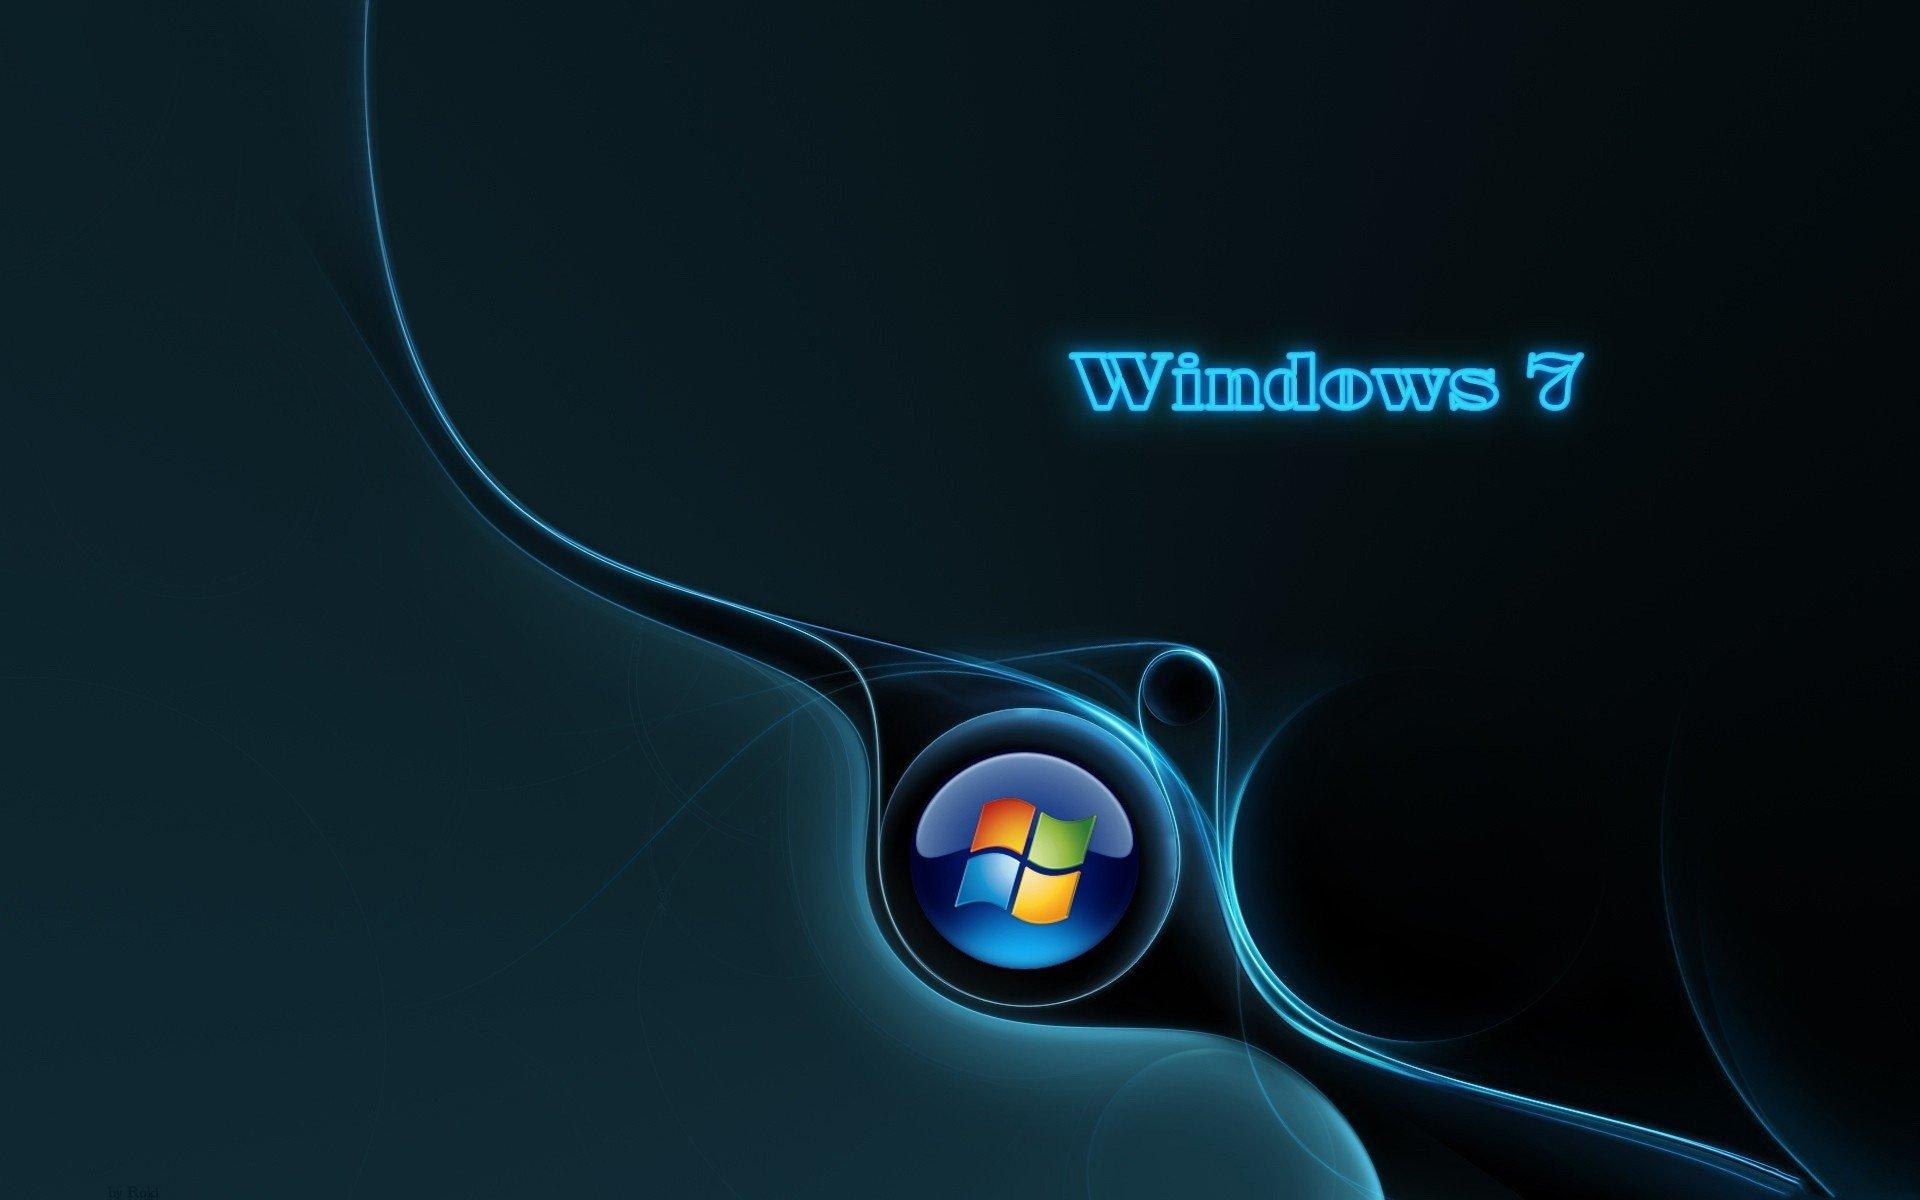 windows 7 hd wallpaper